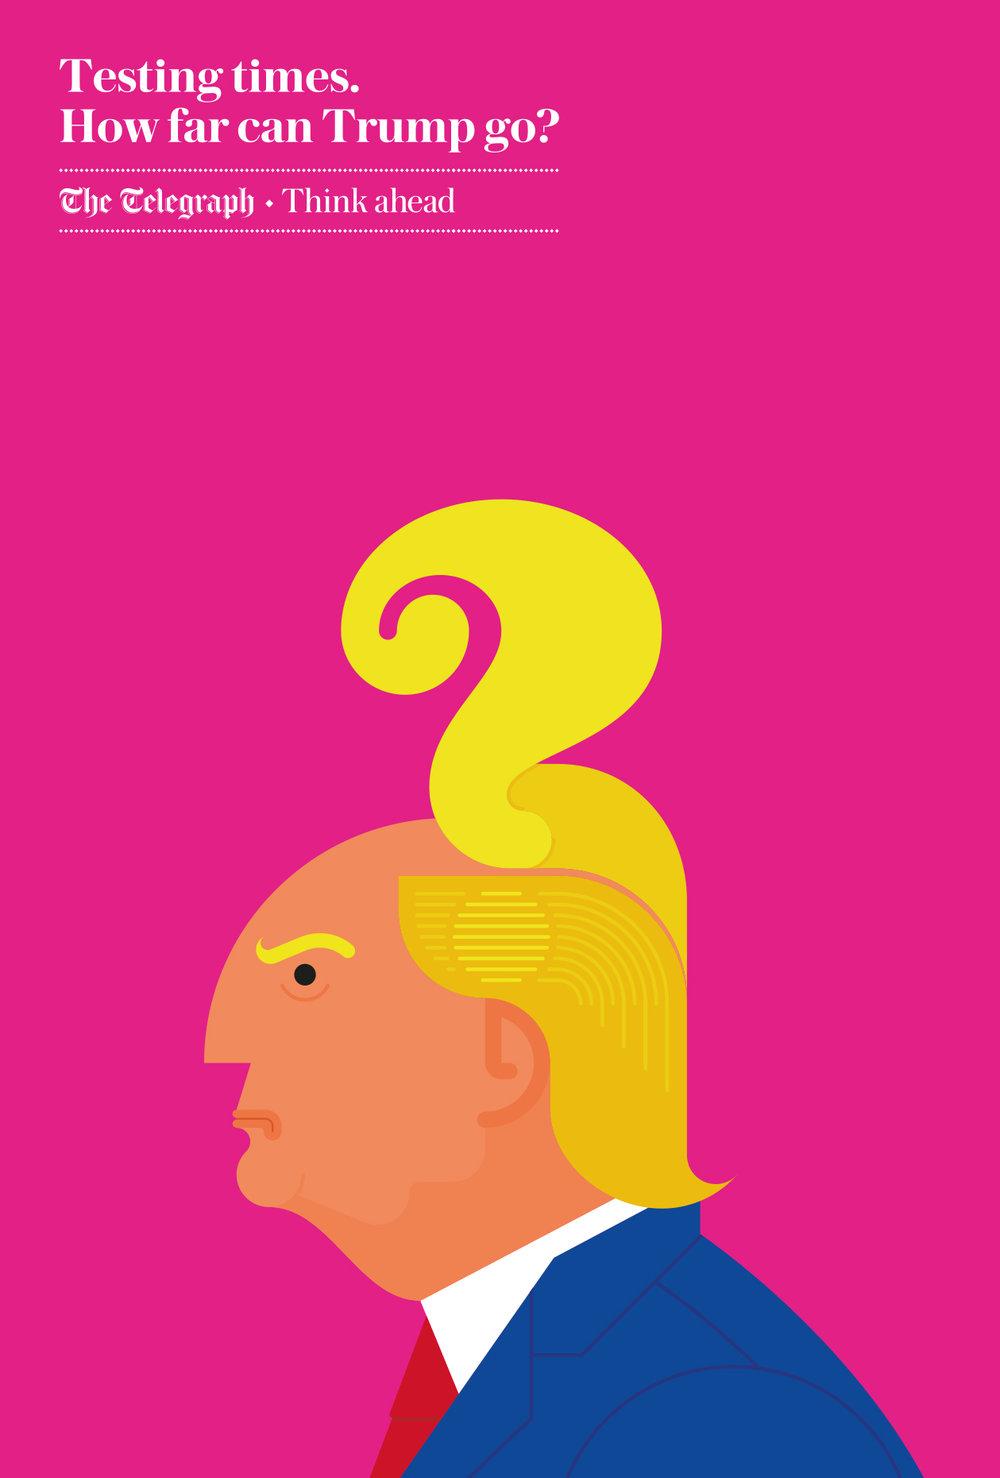 Pate_Telegraph-Trump_Correct.jpg